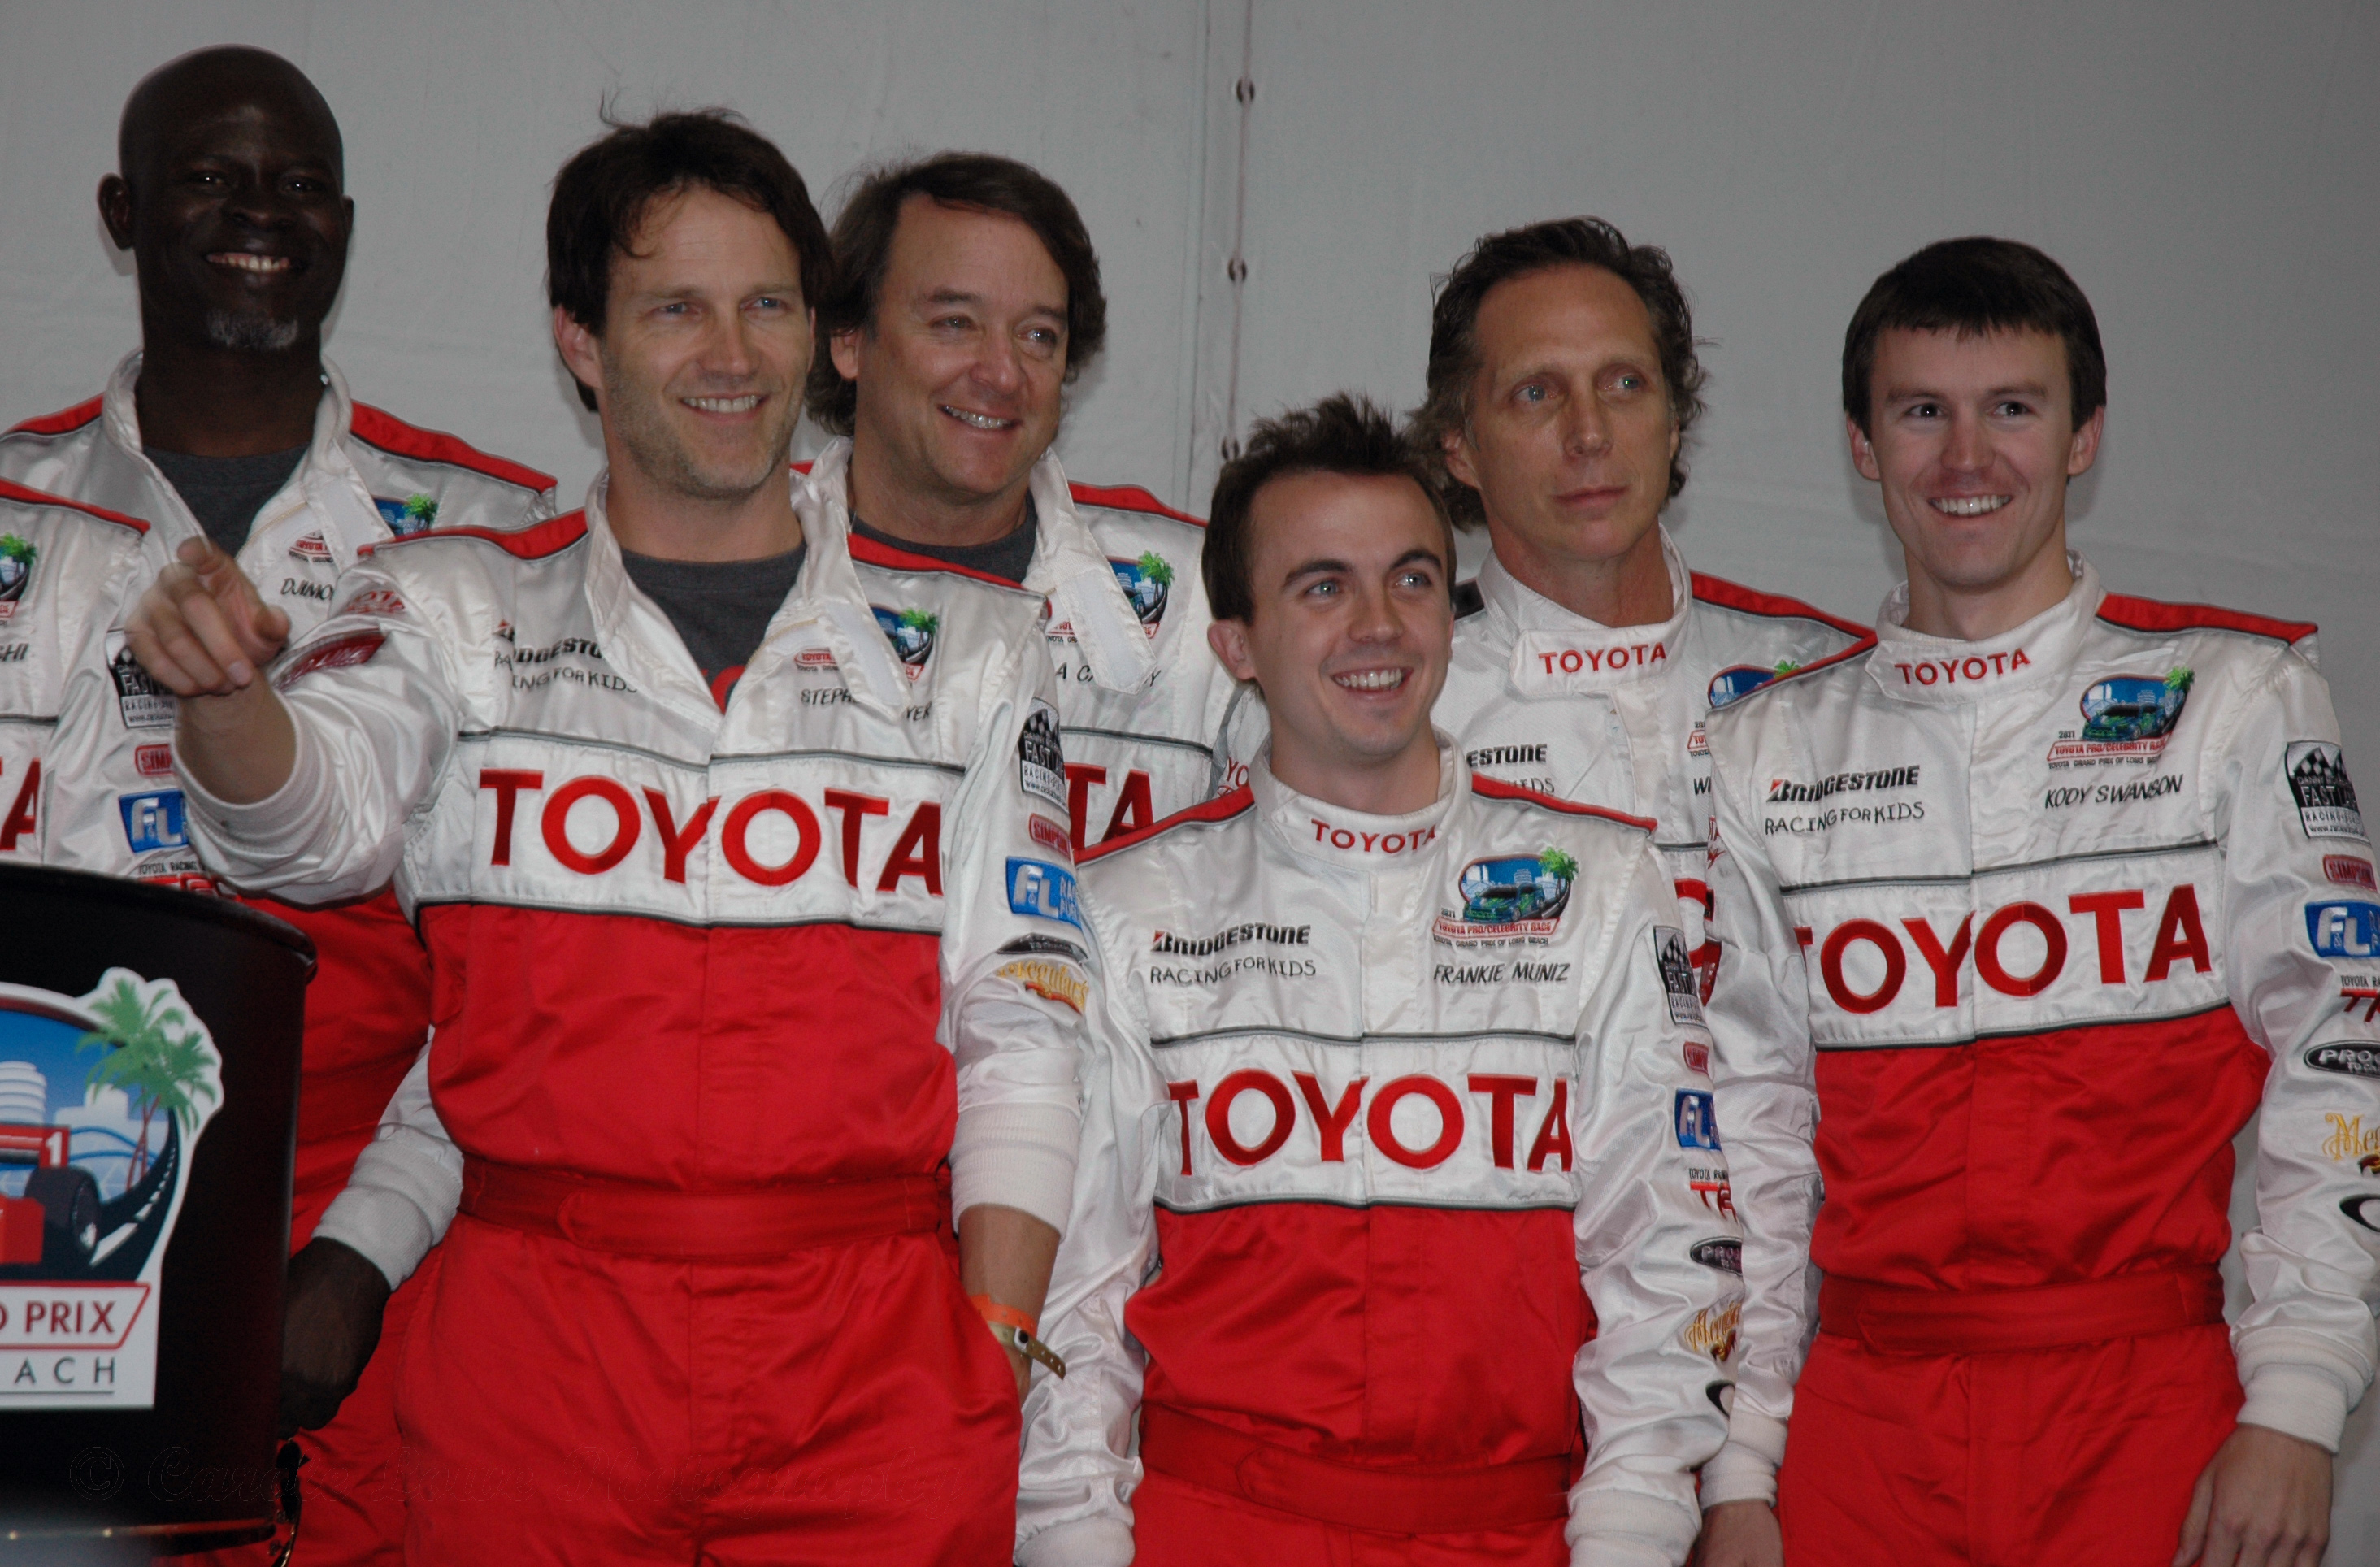 frankie-muniz-and-company-toyota-grand-prix-celebrity-race-2011